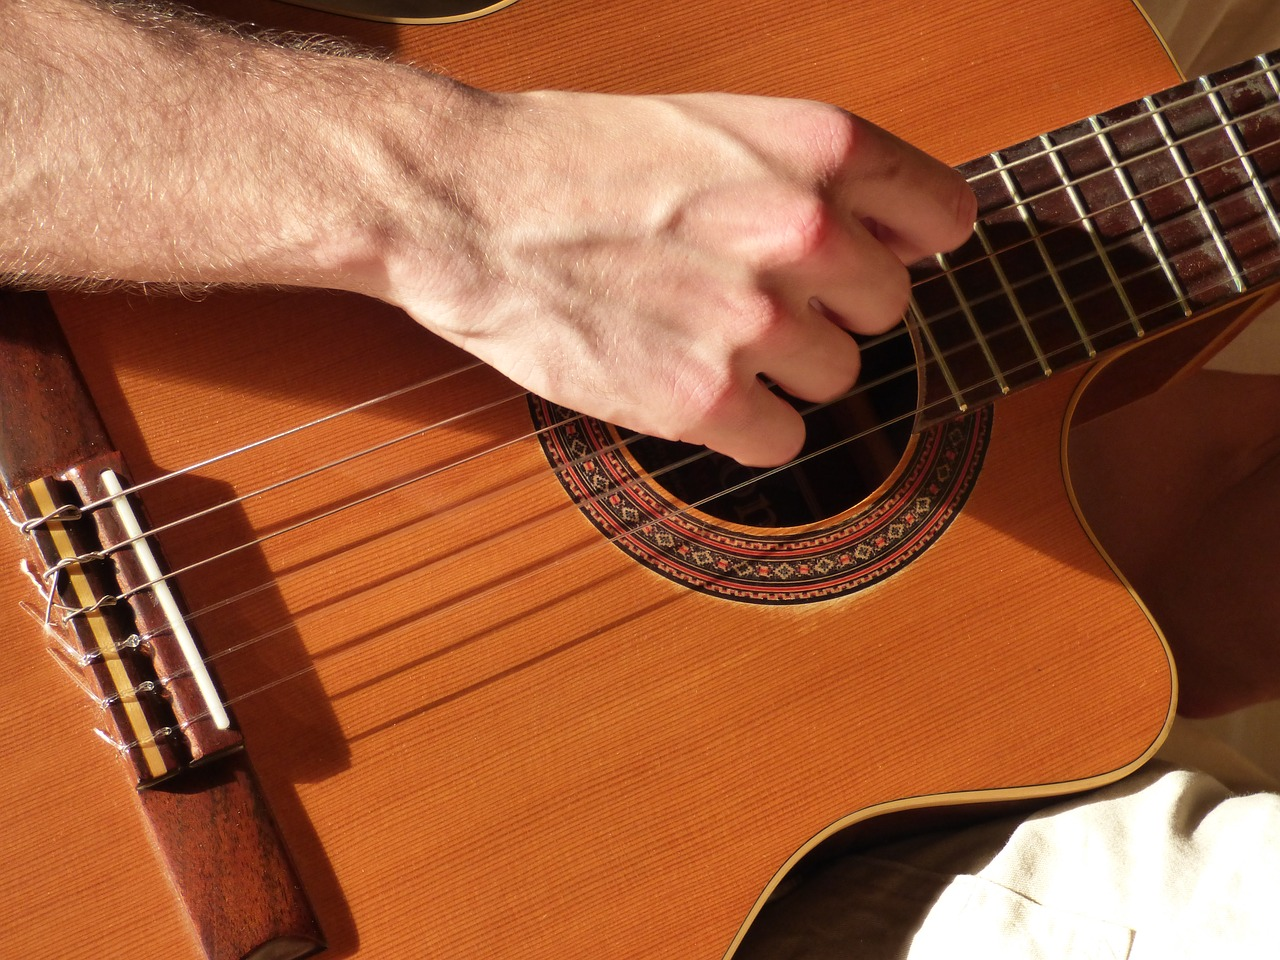 guitar-1812780_1280 (1).jpg